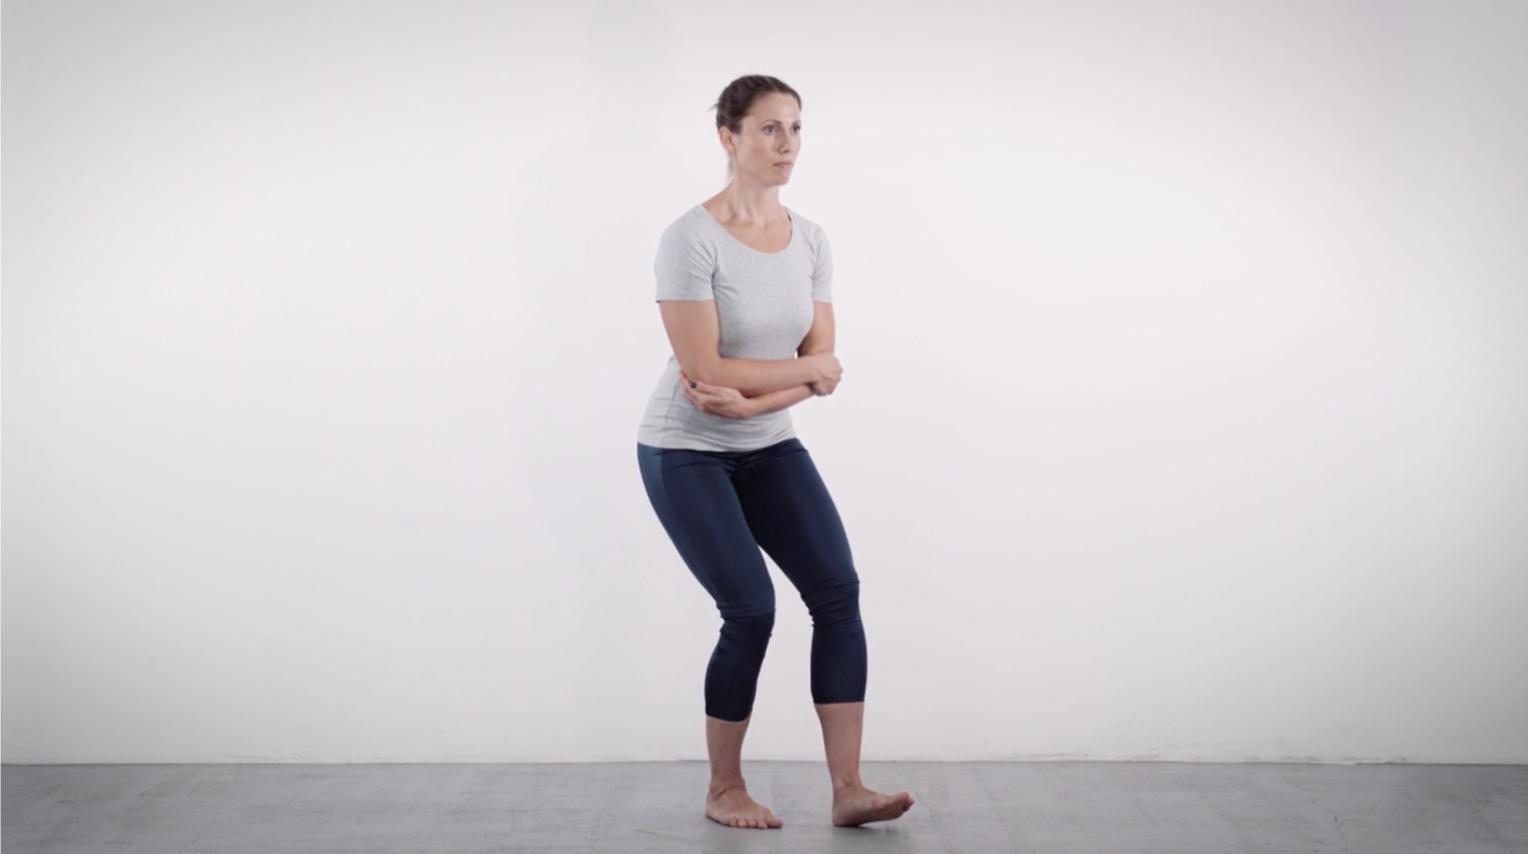 Single-leg squat in Easy-Mode